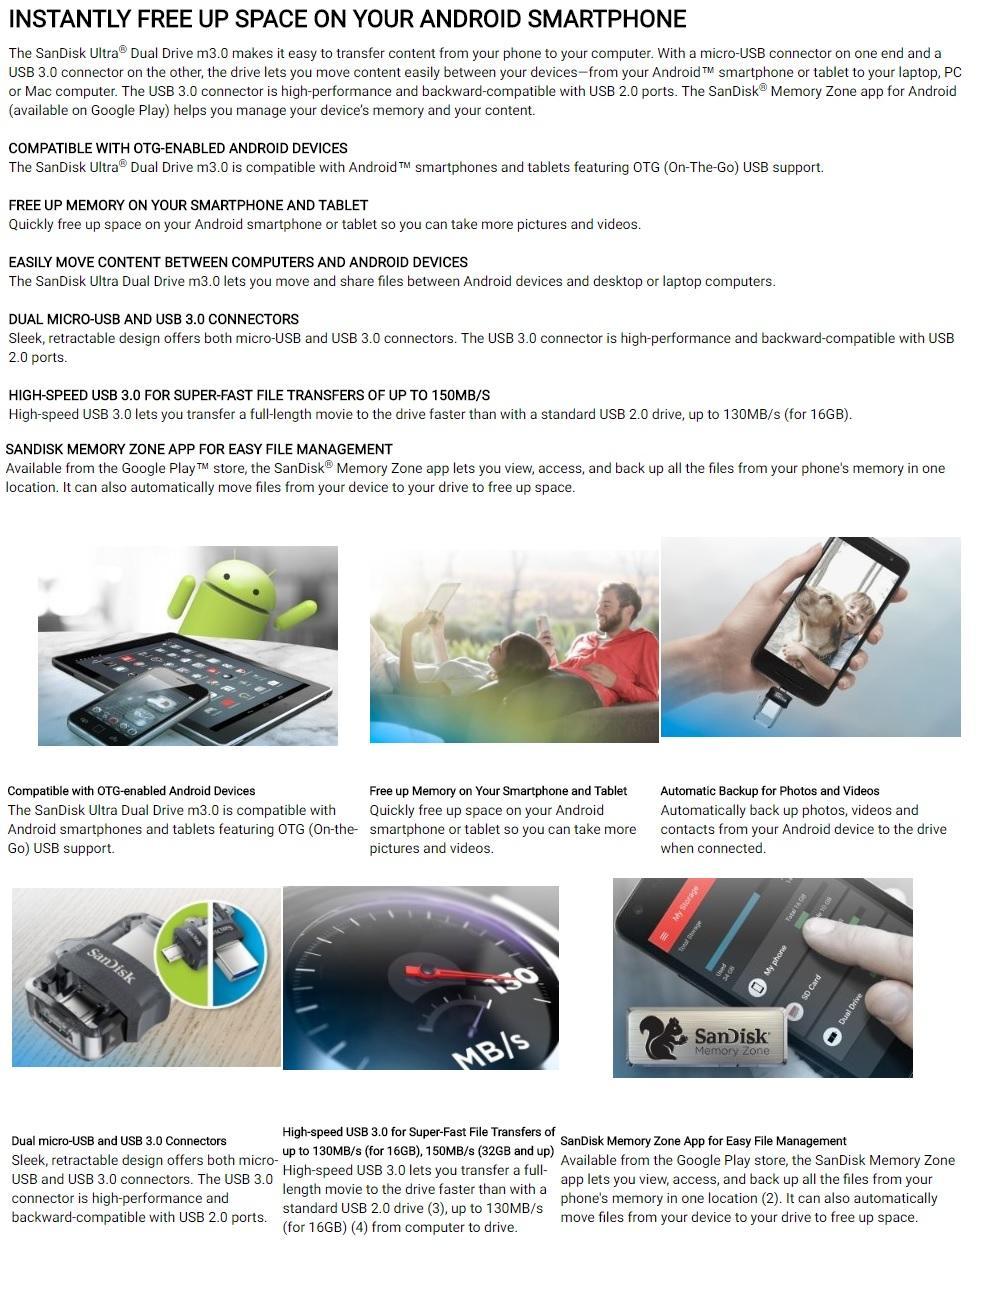 Sandisk Ultra Sddd3 016g 16gb Otg Dual Usb Drive M30 Translucent 16 Gb Specifications Of Black